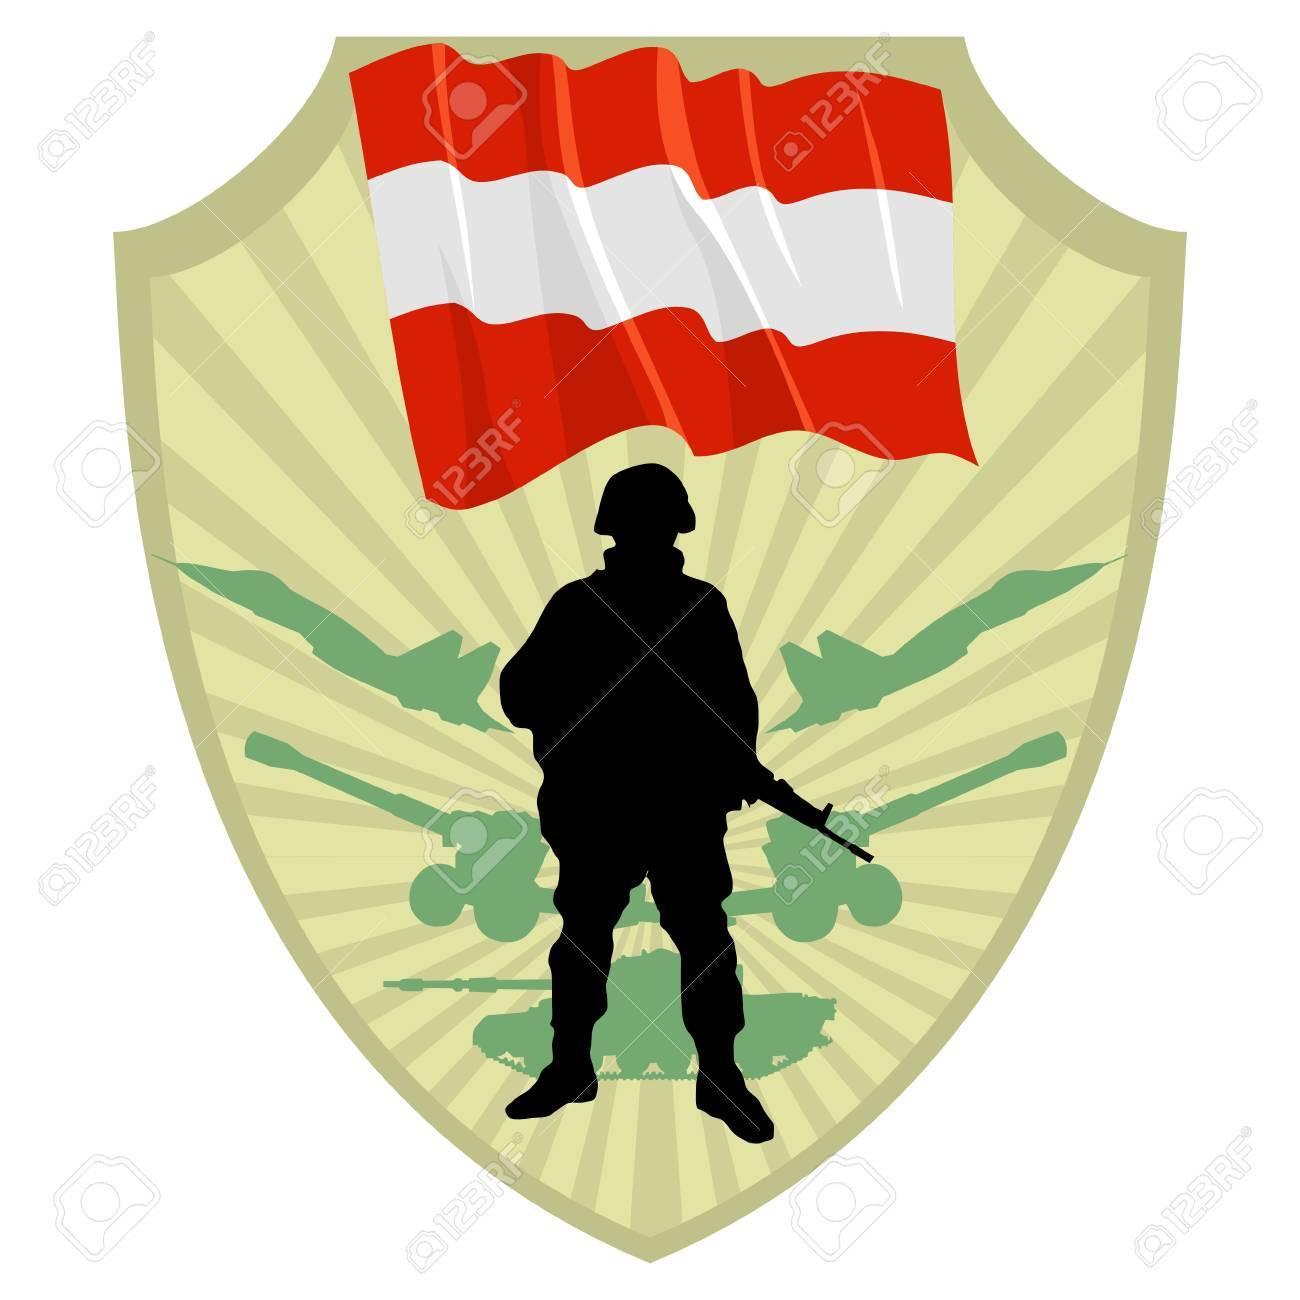 Army of Austria Stock Vector - 13322658